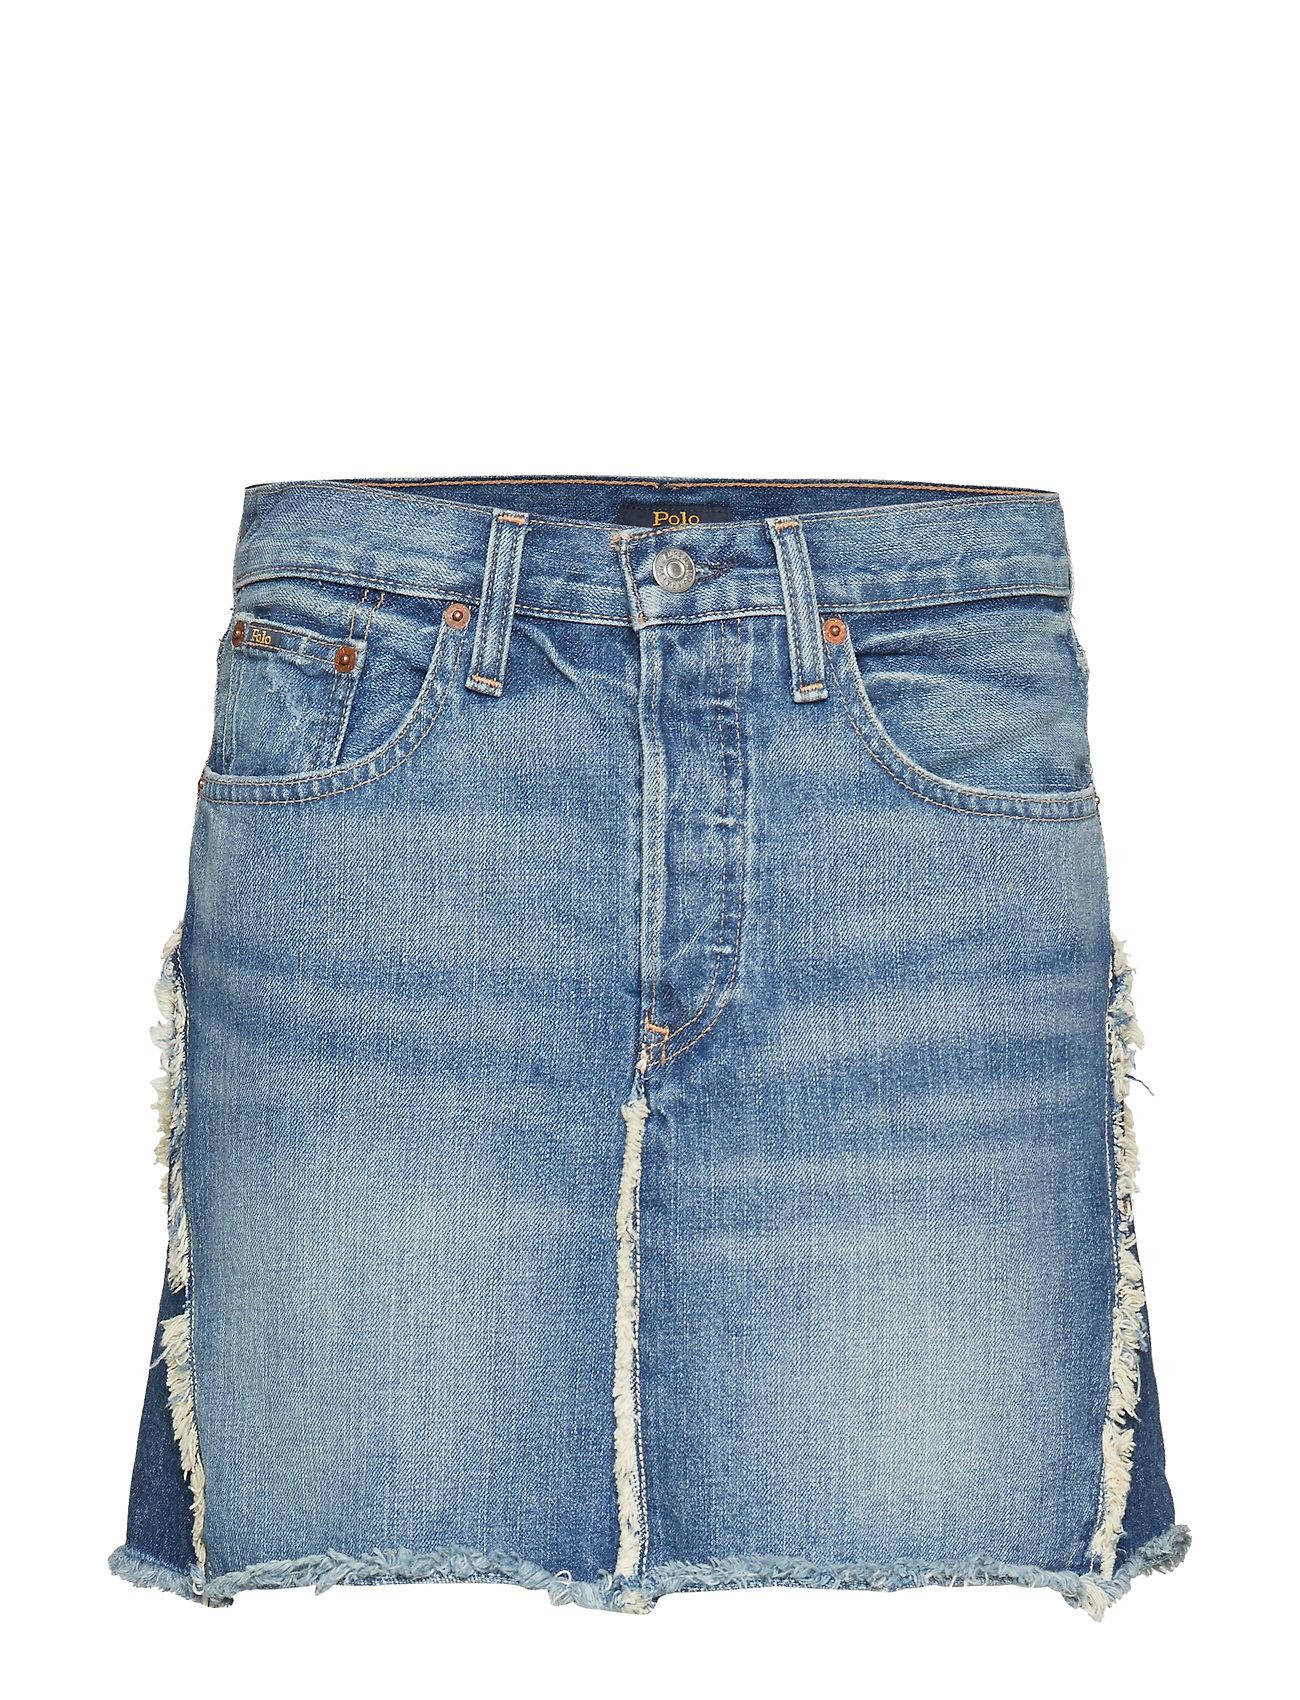 Polo Ralph Lauren Two-Tone Denim Skirt